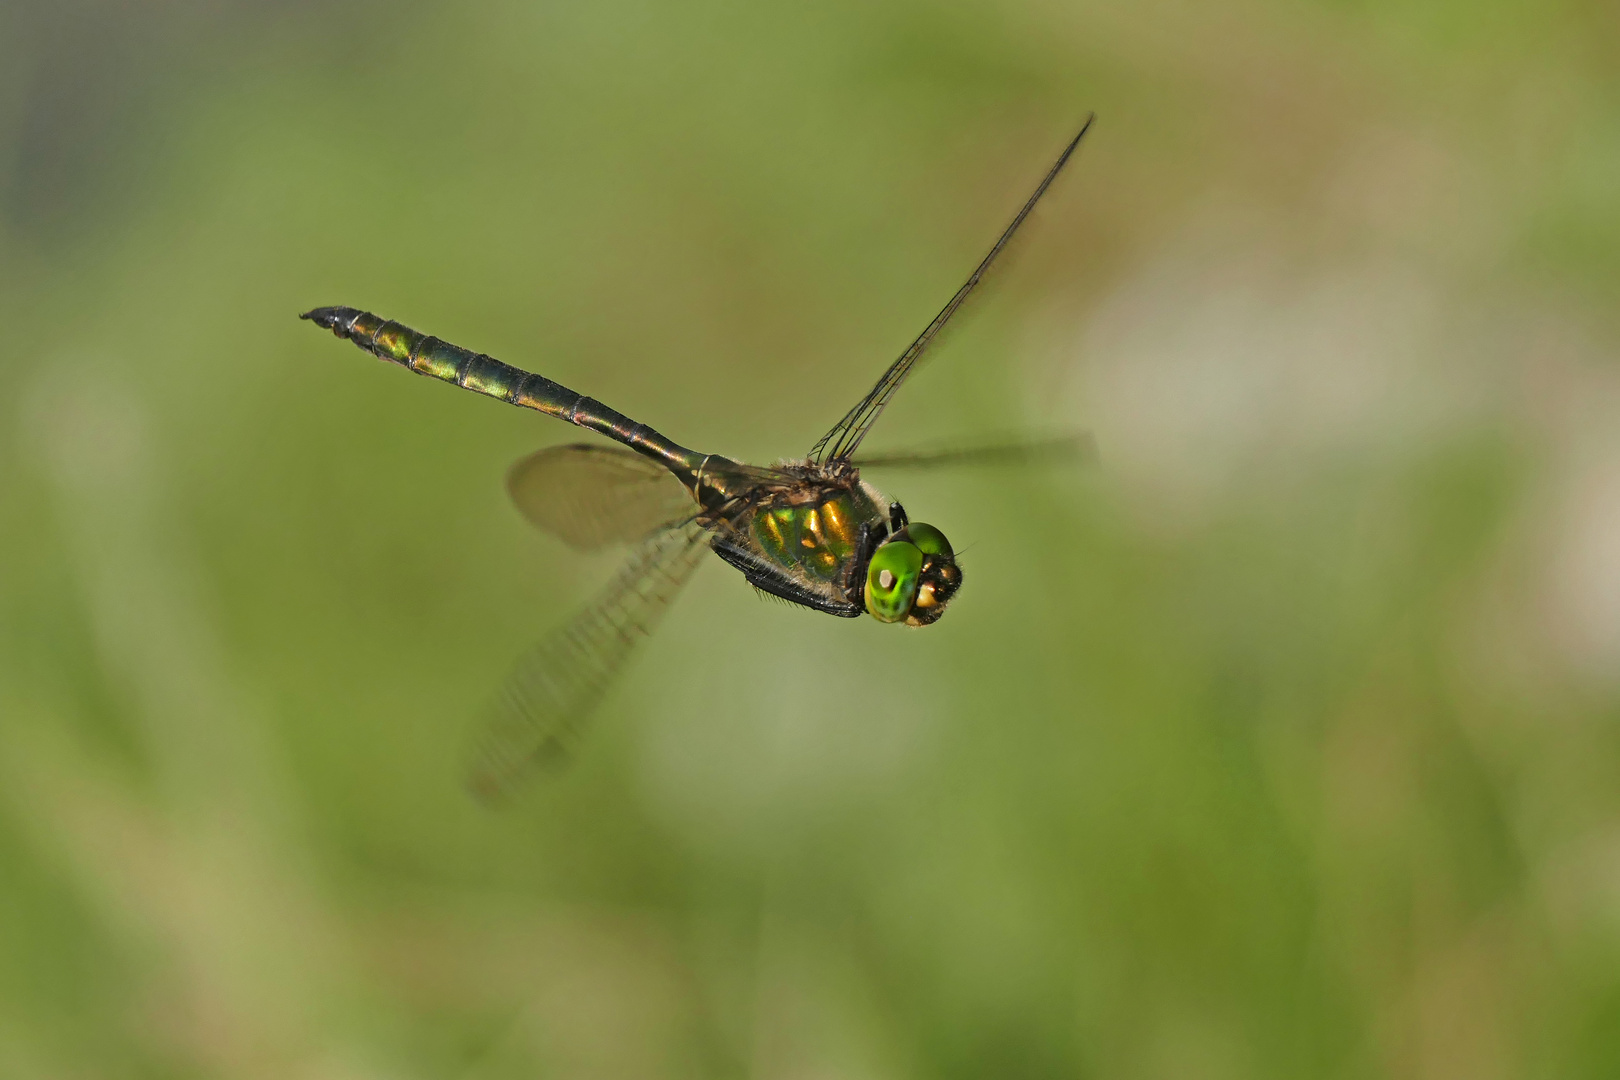 Flugkünstler (Smaragdlibelle, Cordulia aenea)